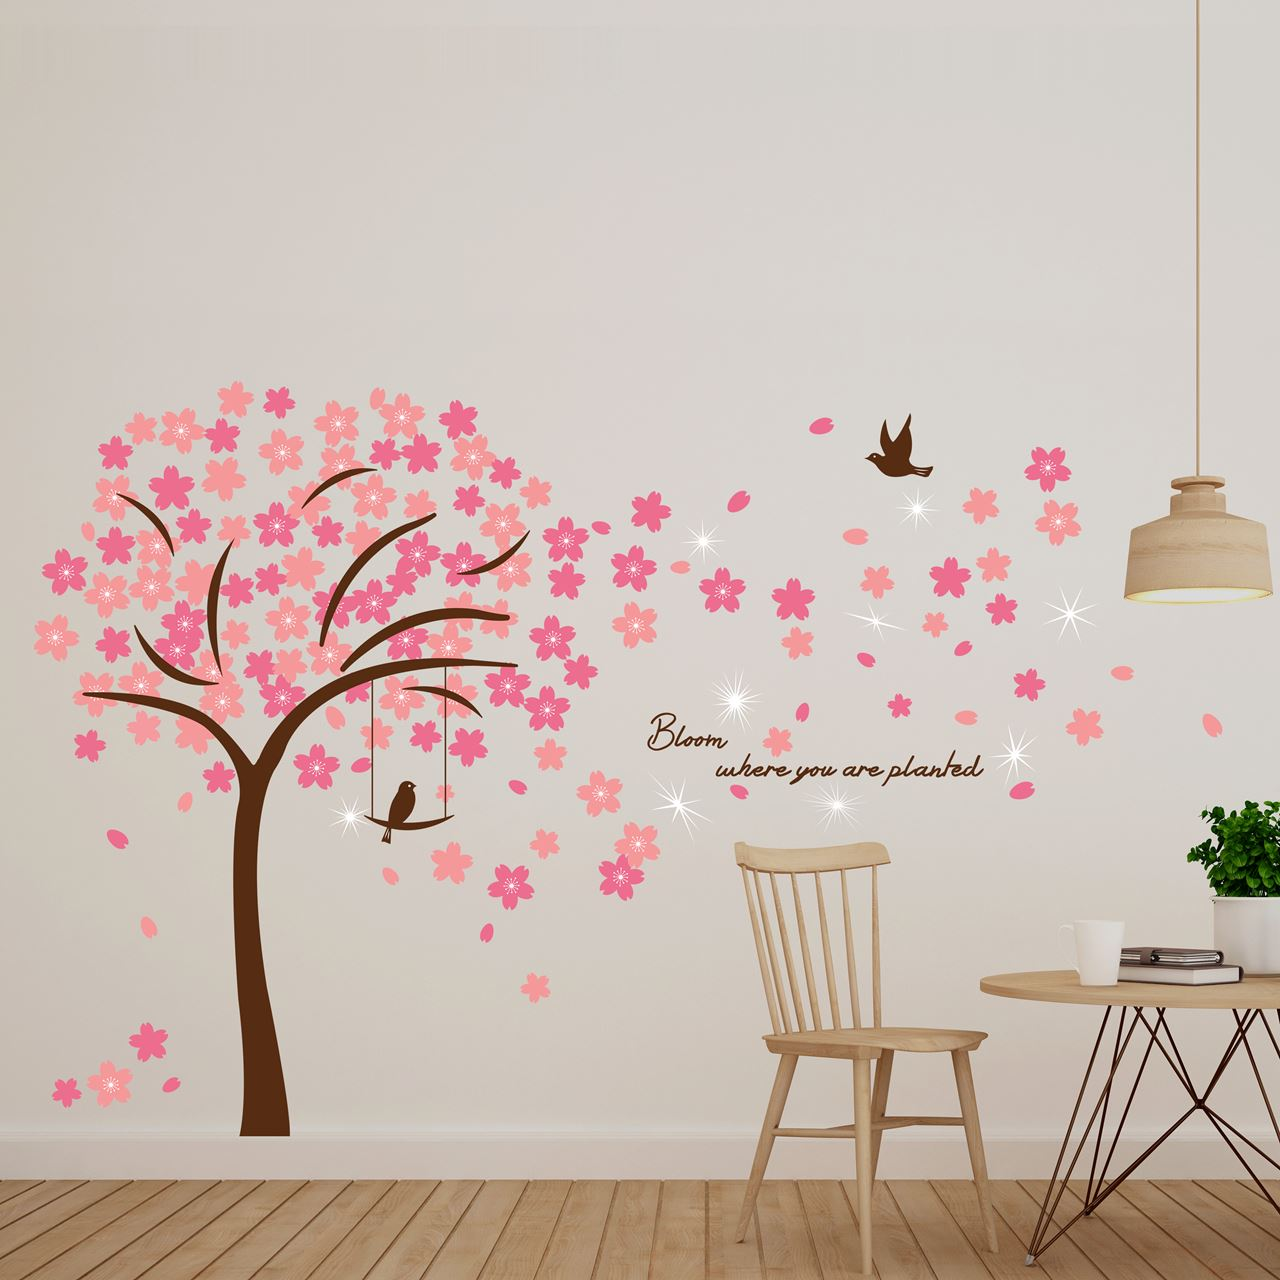 Channeldistribution walplus home decoratie sticker roze bloesem met 9 swarovski kristallen - Home decoratie met tomettes ...